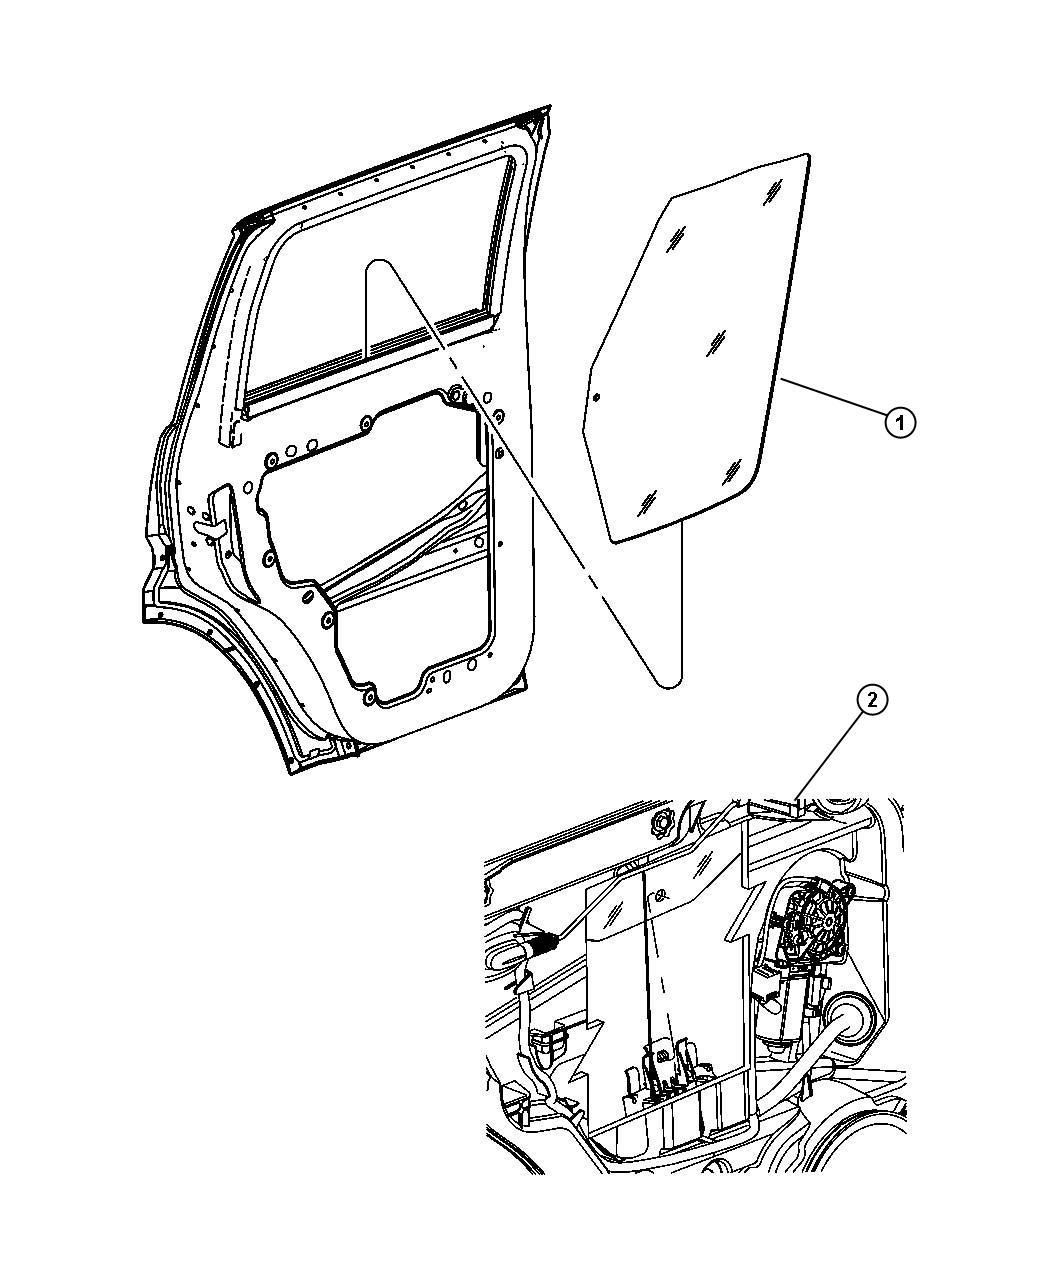 91 S10 Fuse Box - Wiring Diagram Schematics  S Fuse Box Location on